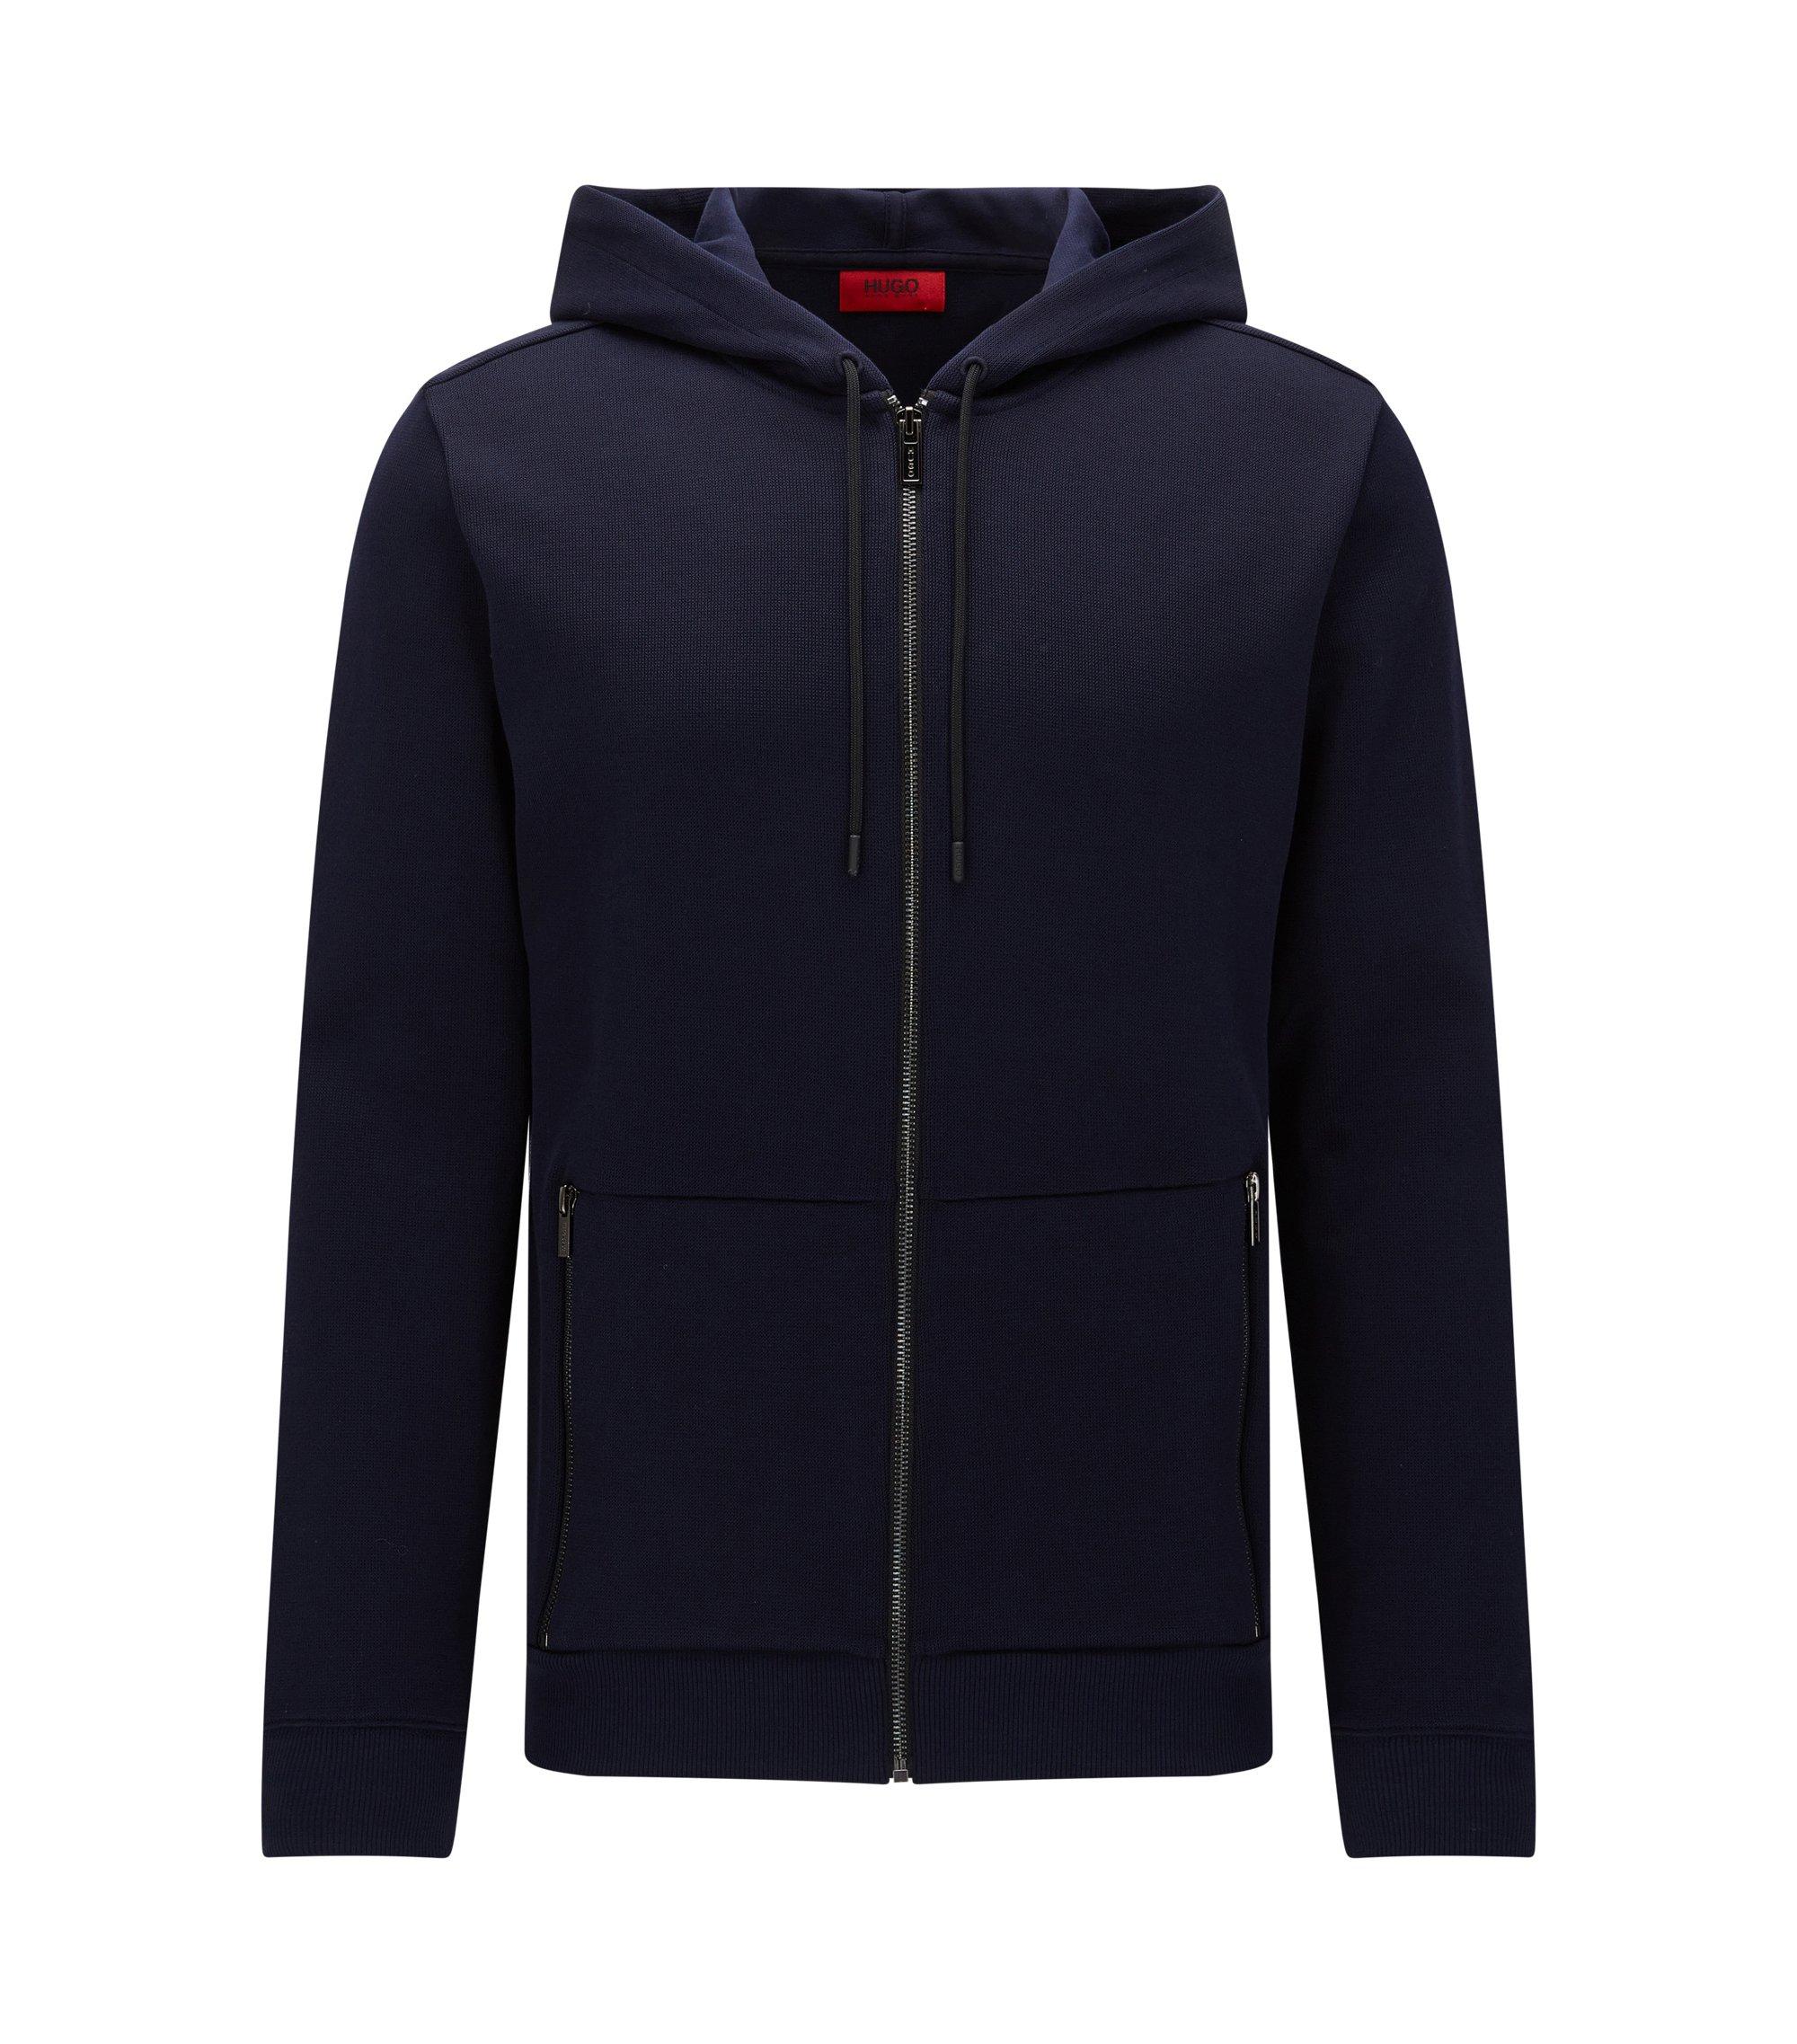 Cotton Hooded Sweatshirt | Dampton, Dark Blue